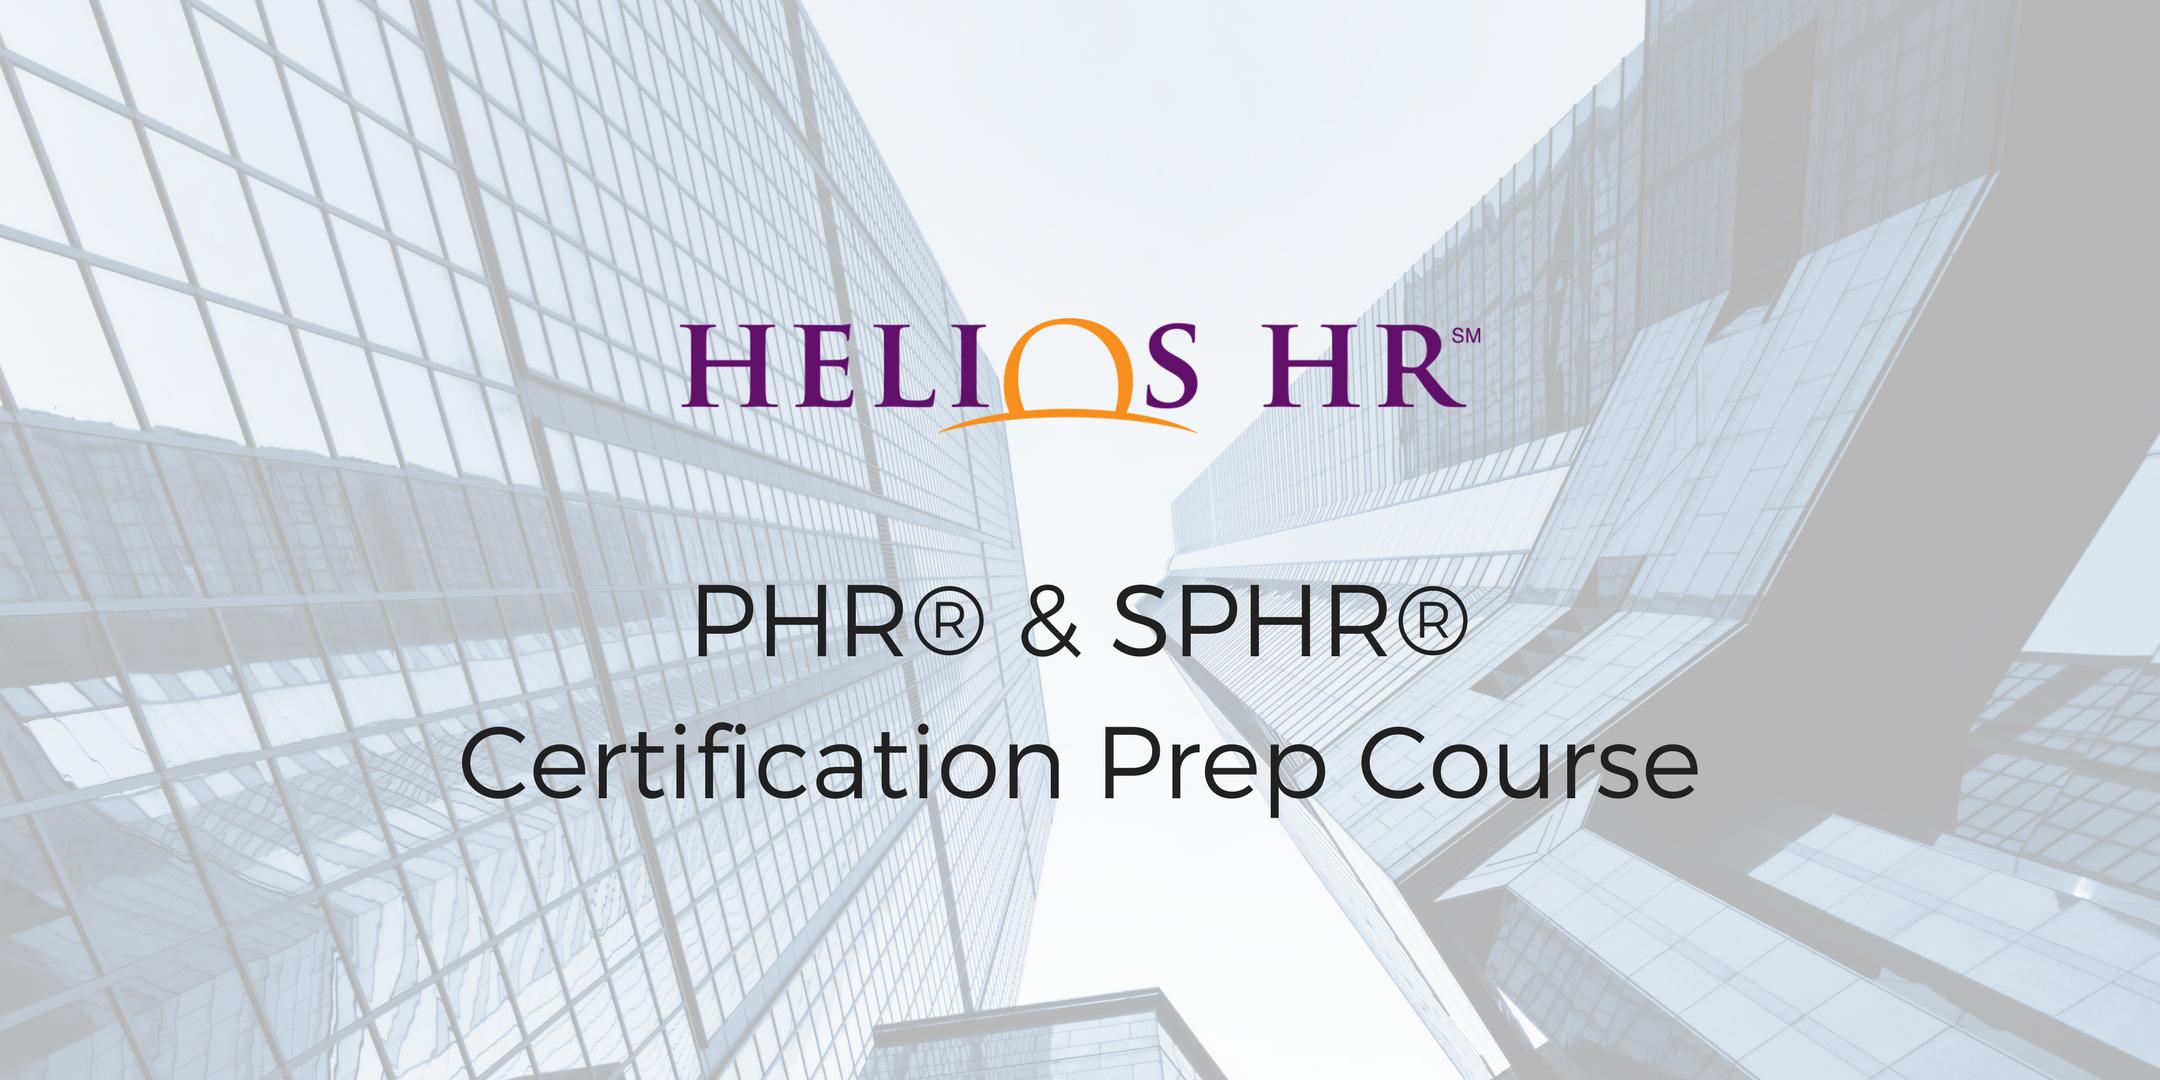 Phr shrm certification prep course 13 mar 2018 phr shrm certification prep course 1betcityfo Choice Image